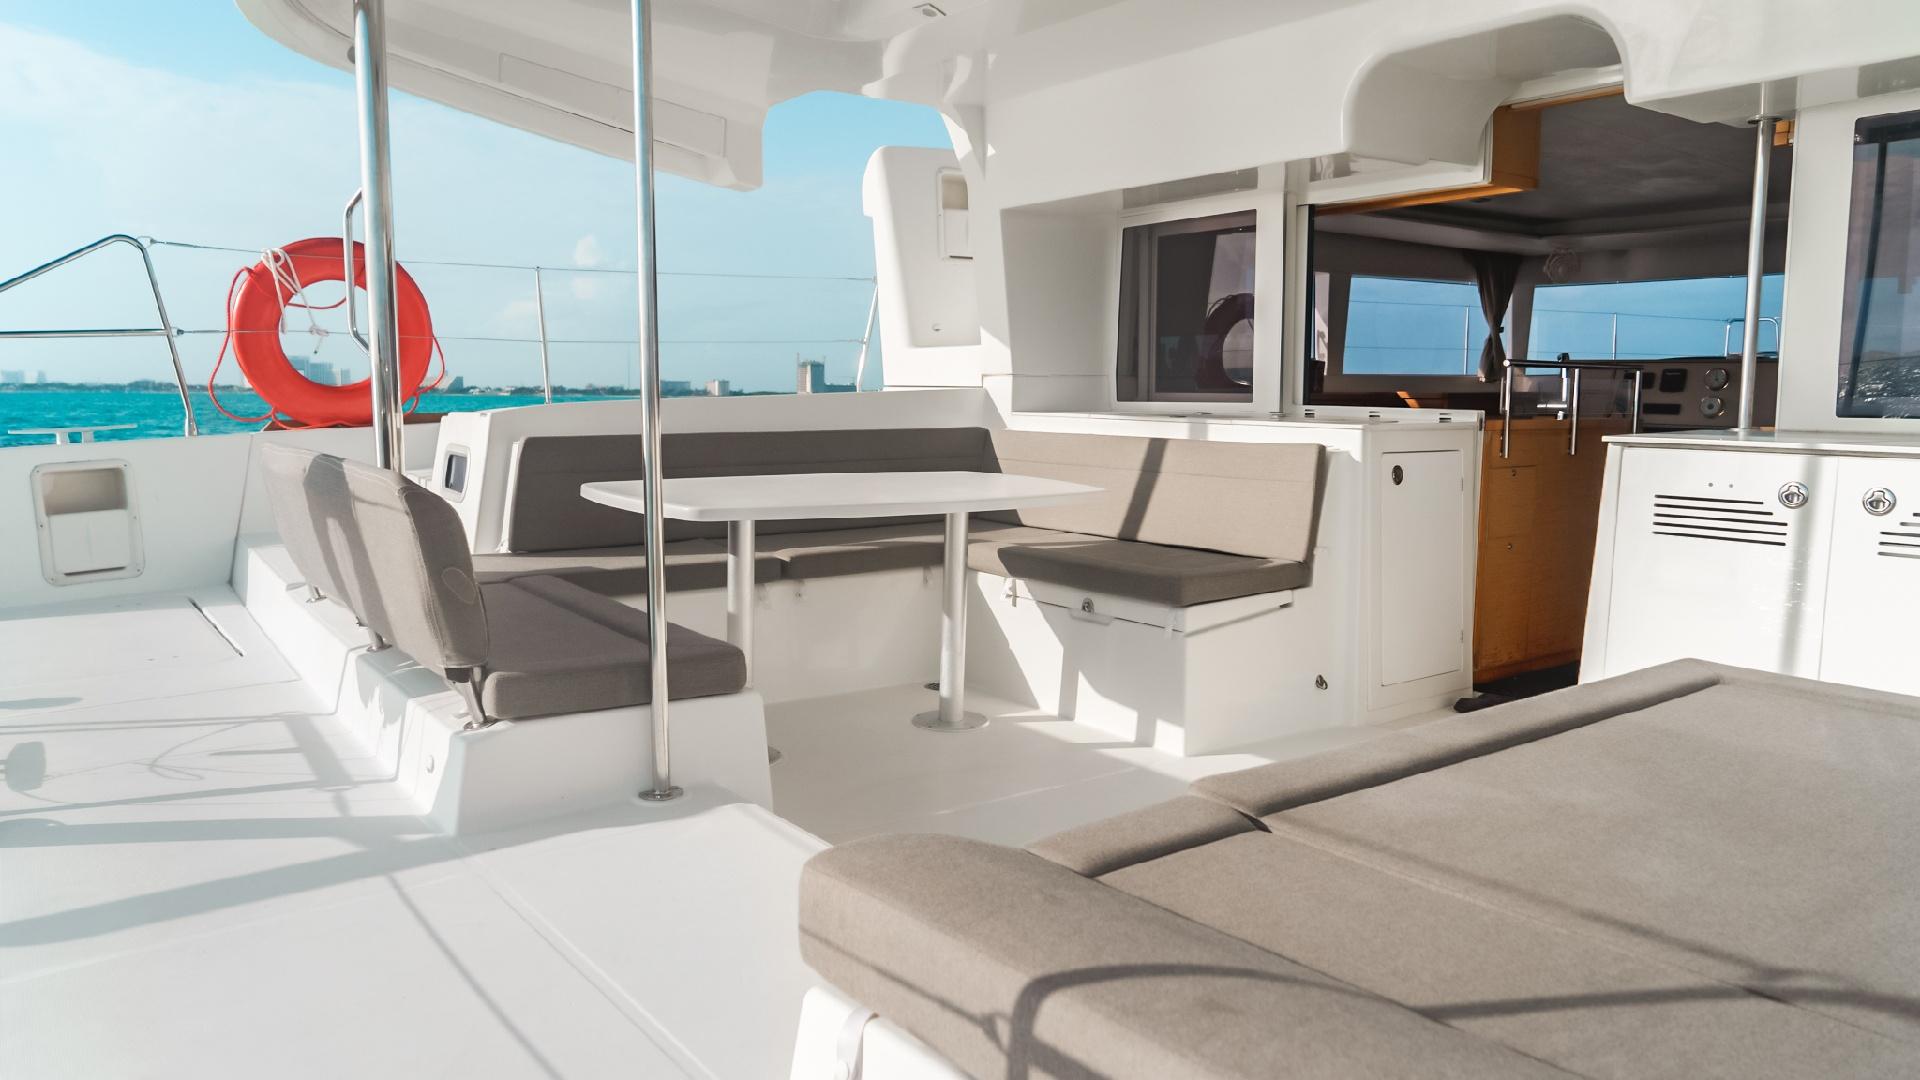 1 - LowRes - Lohengrin - Private tour to Isla Mujeres in catamaran - Cancun Sailing